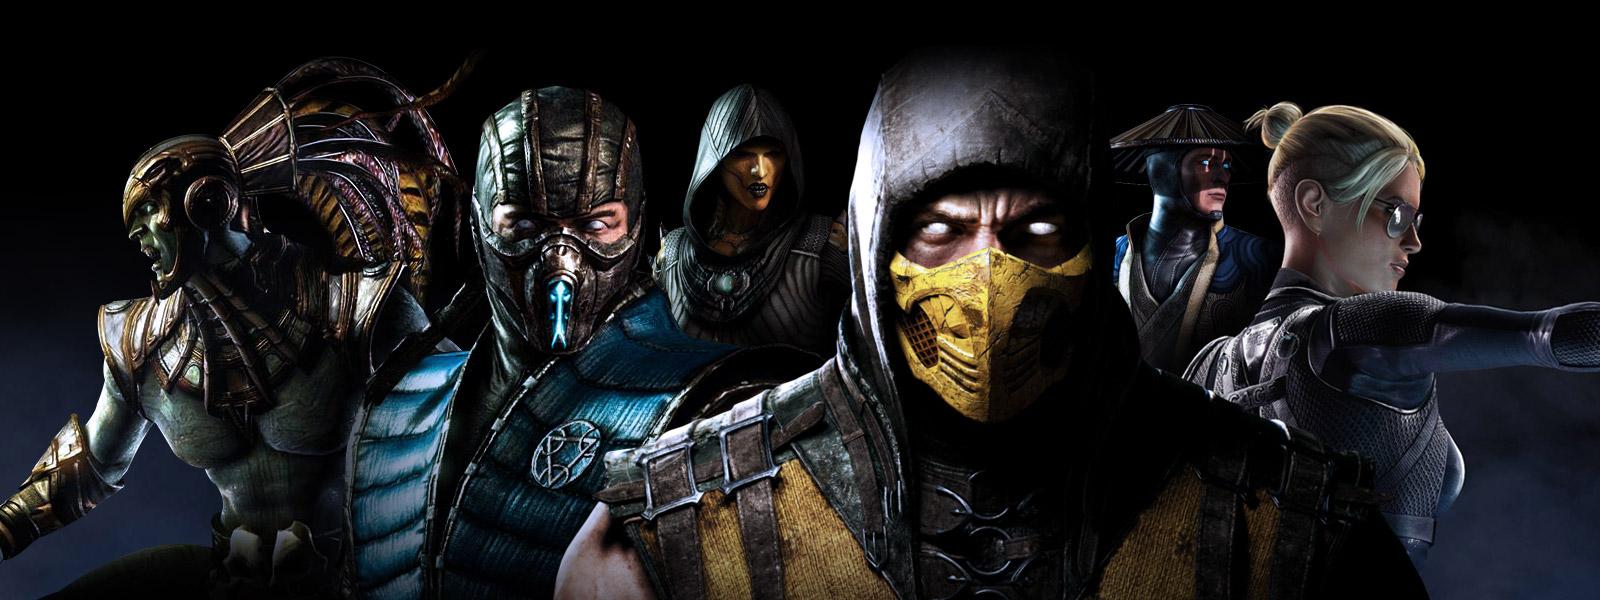 FREE DLC – Classic Fatalities for Mortal Kombat X